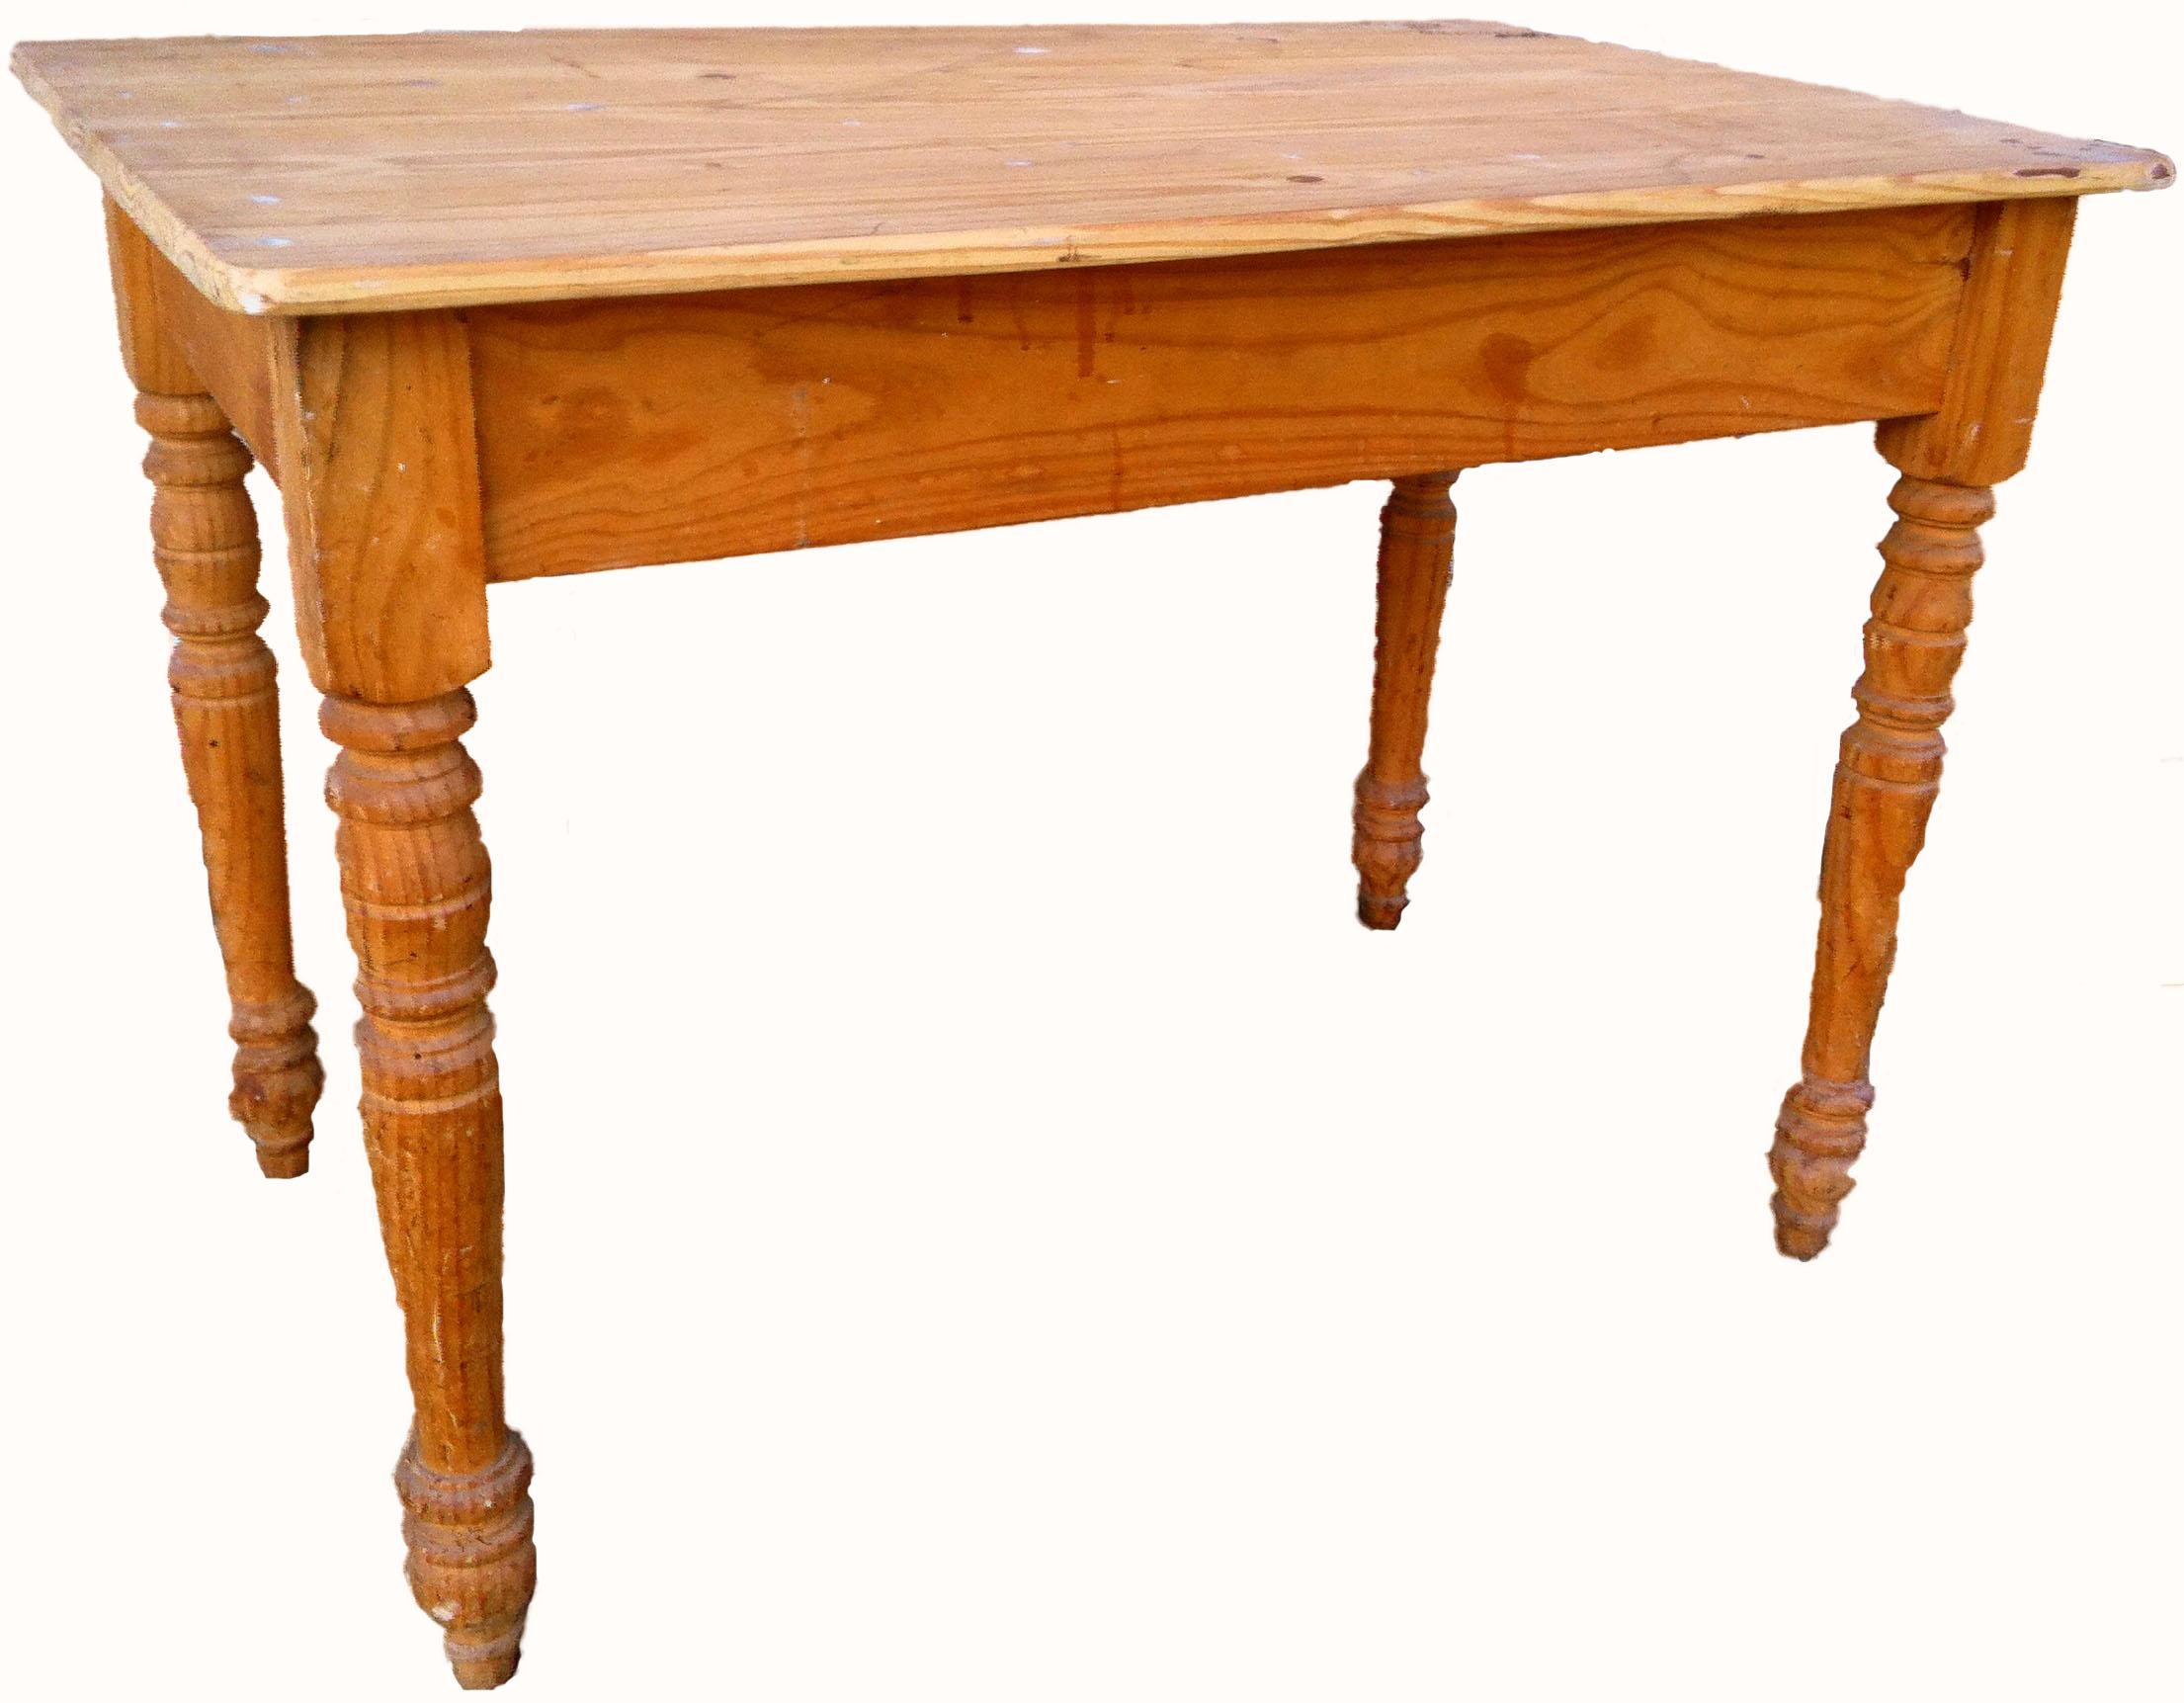 Linea comedor carpinteria restauracion - Mesa comedor antigua ...